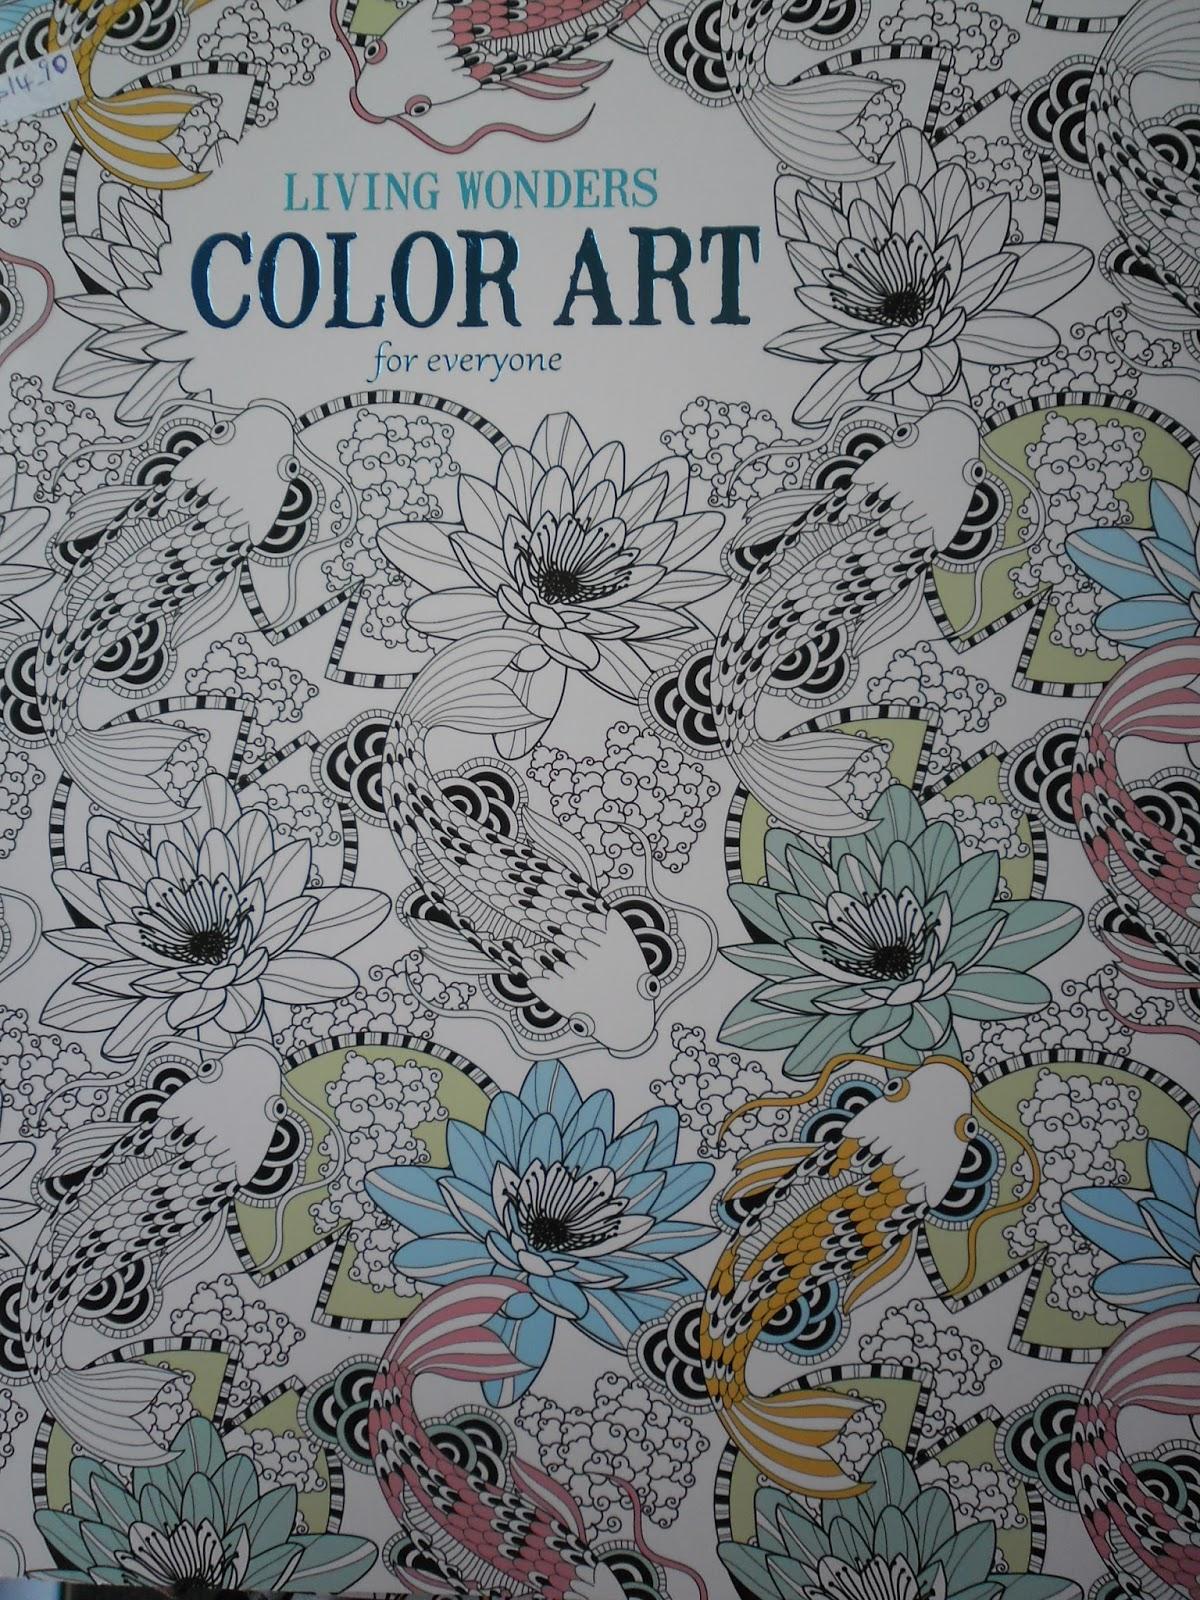 Color art living wonders - Dianne